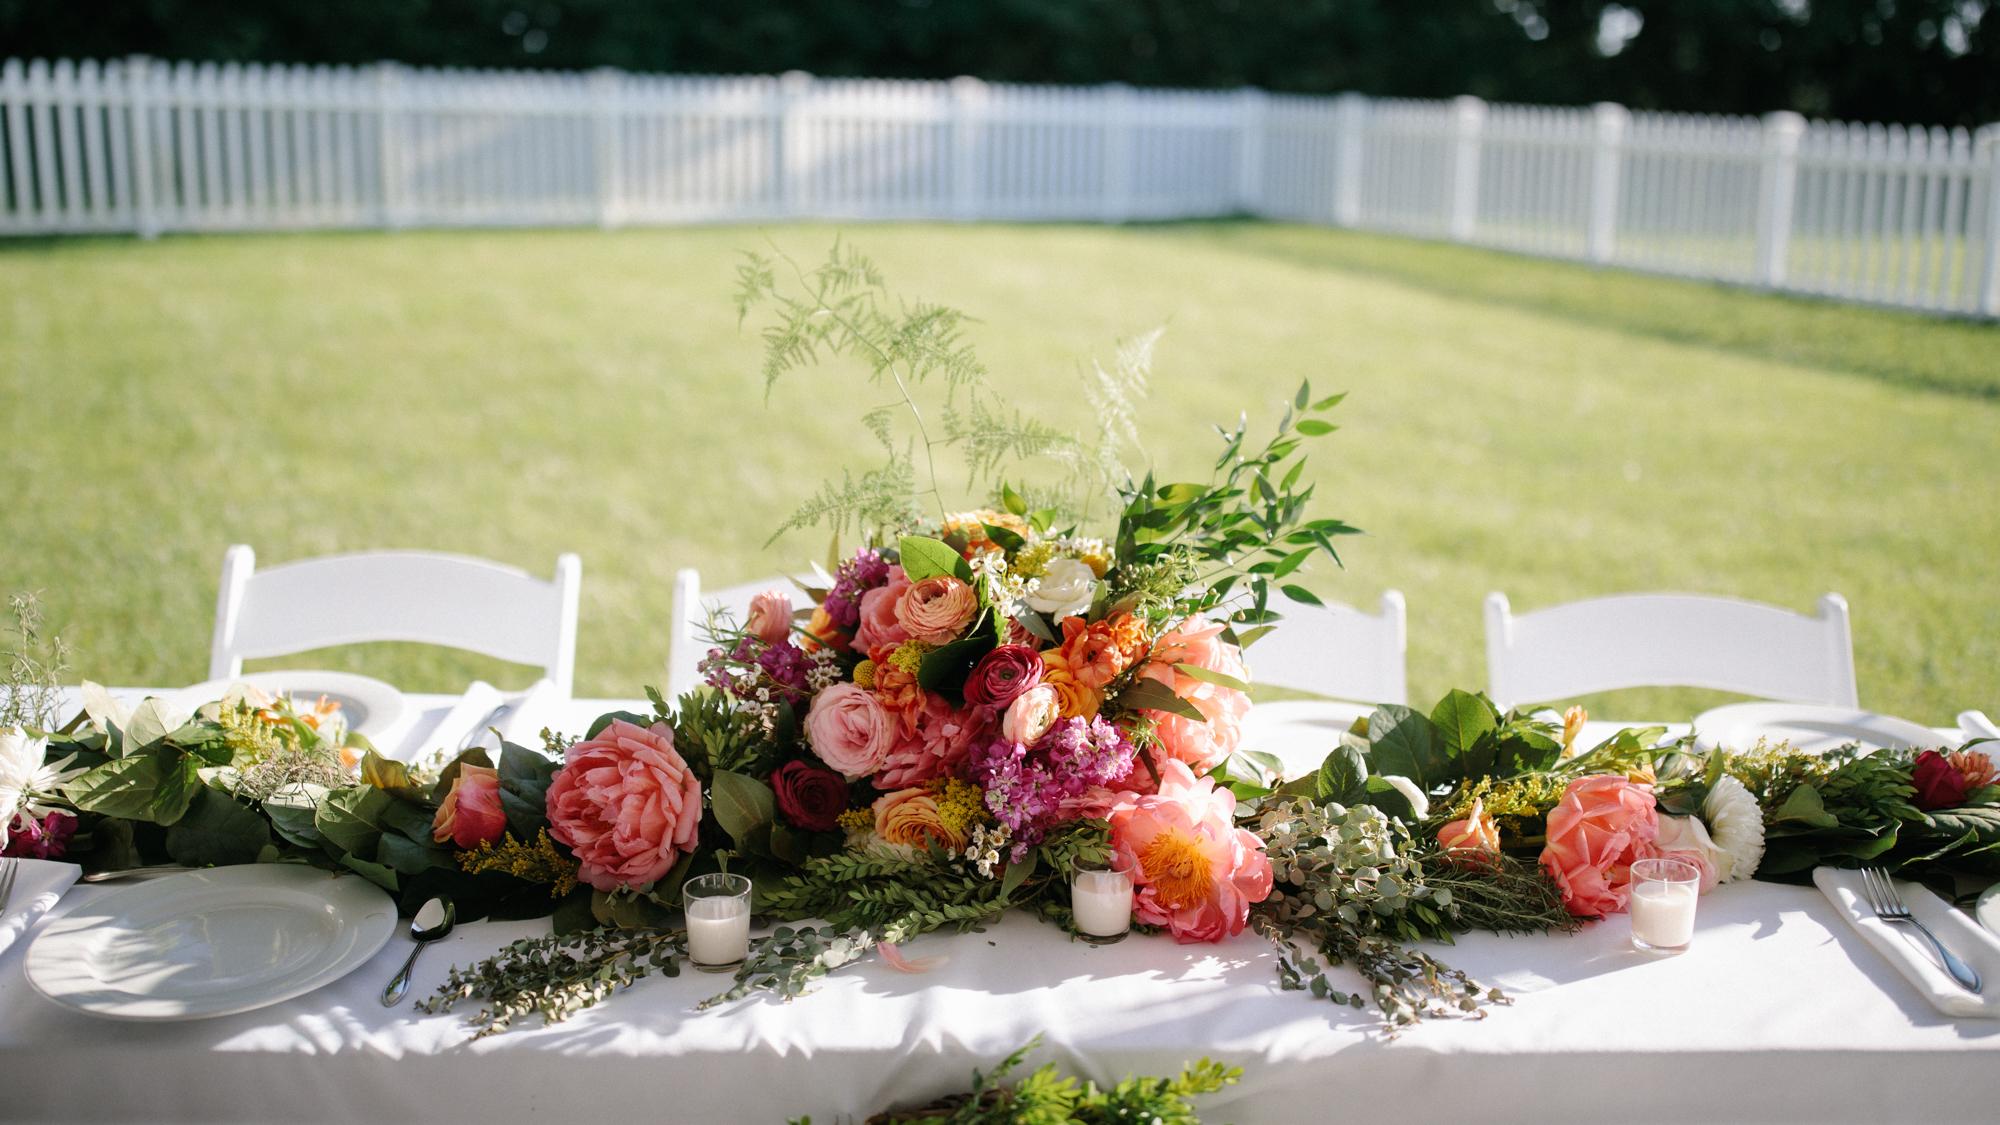 alec_vanderboom_kansas_city_mo_wedding_photos-0055.jpg